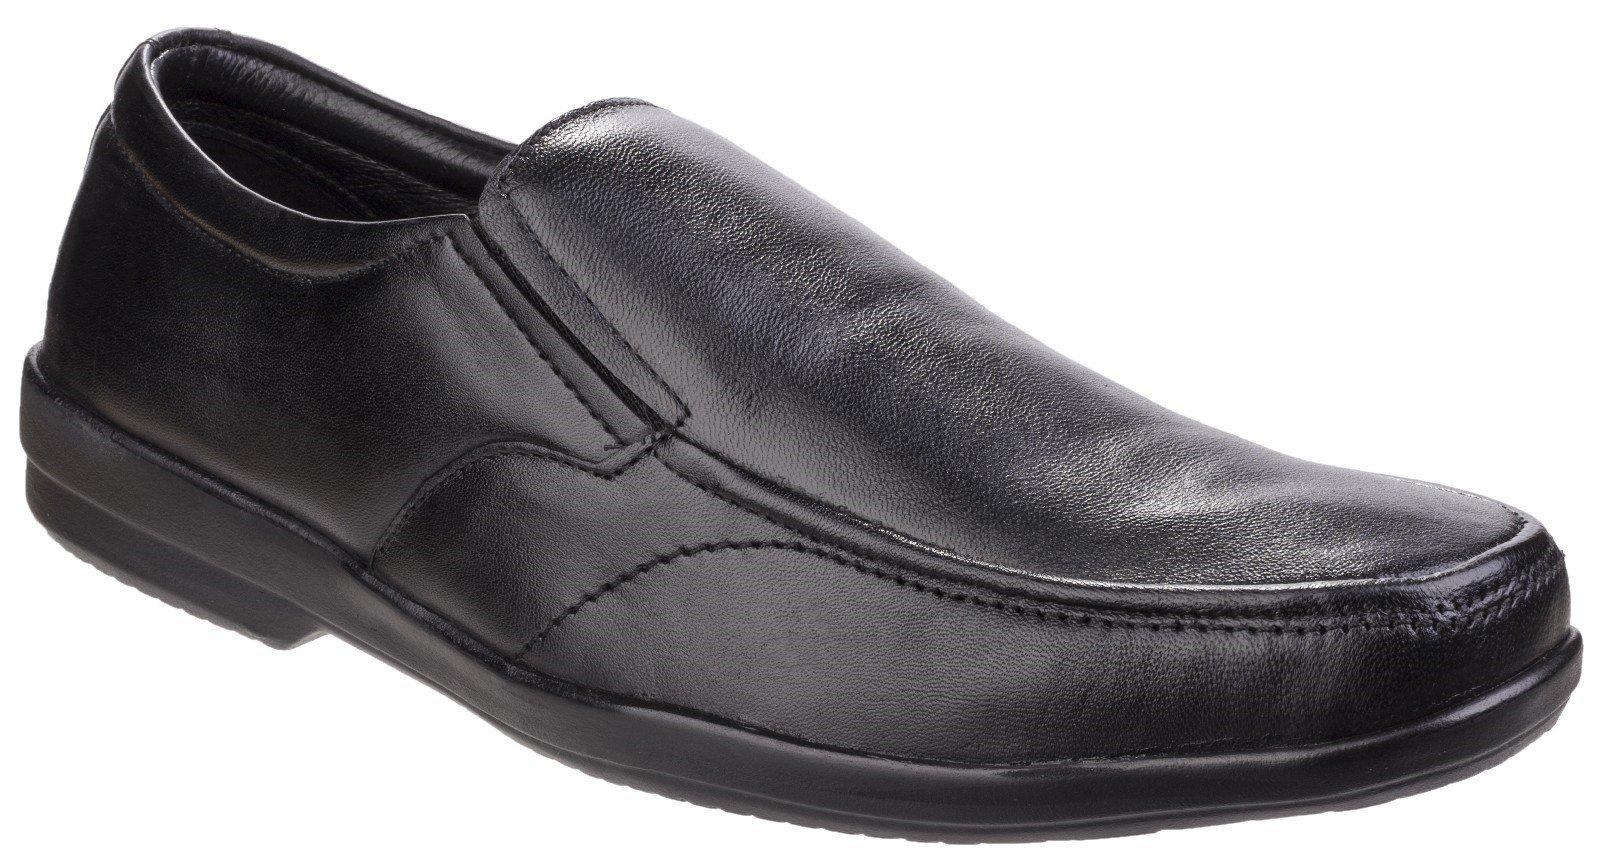 Fleet & Foster Men's Alan Formal Shoe Black 24952-41296 - Black 7